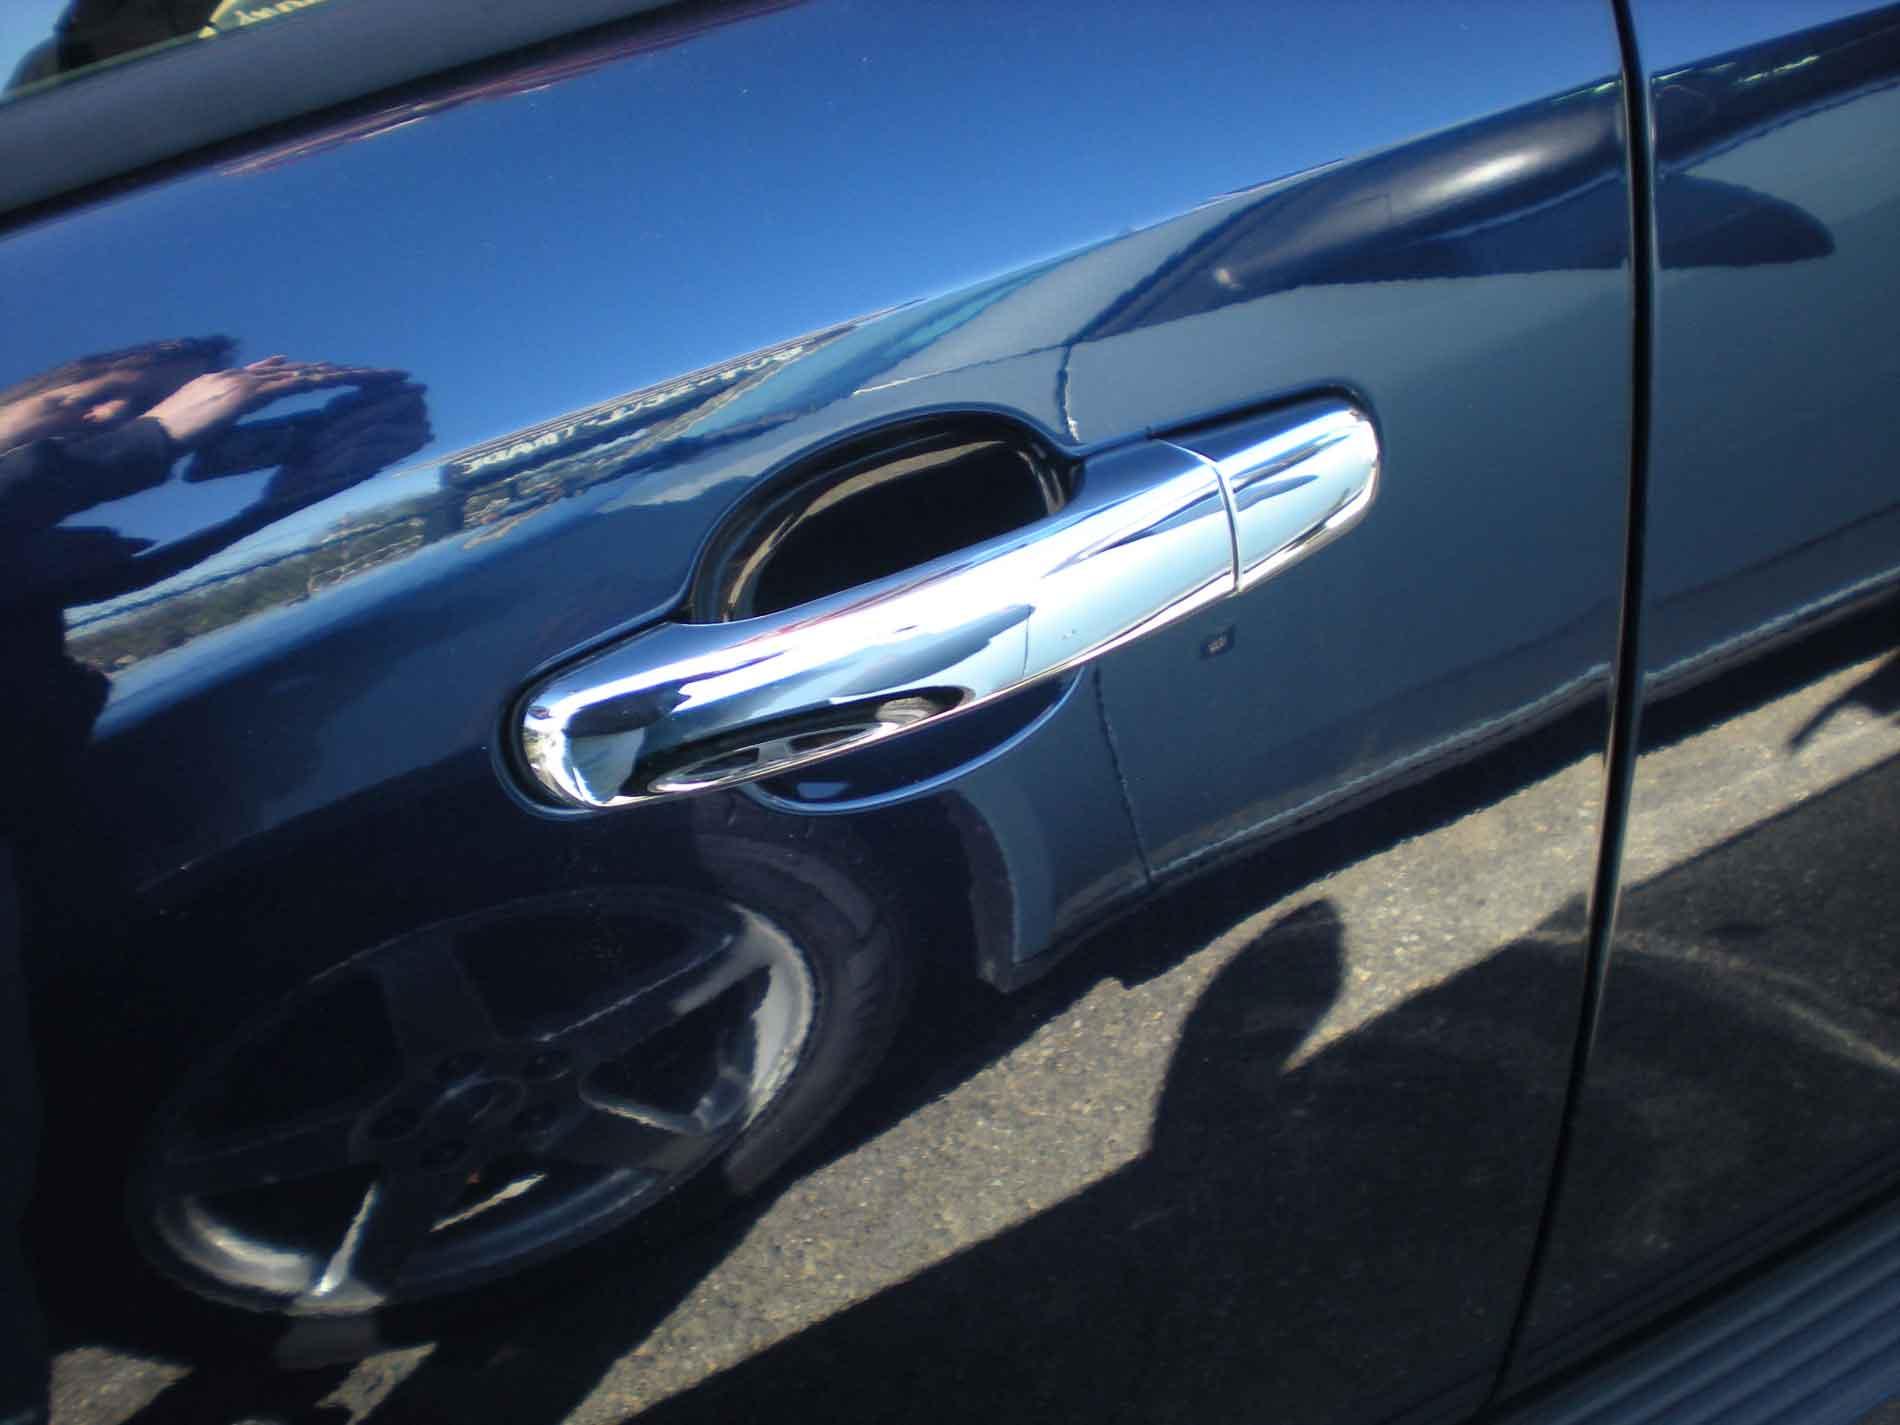 MaxMate 10-13 GMC Terrain//10-13 Chevy Equinox//06-12 HHR//04-12 Malibu Chrome 4 Doors Handle Cover W//O Passenger Side Keyhole